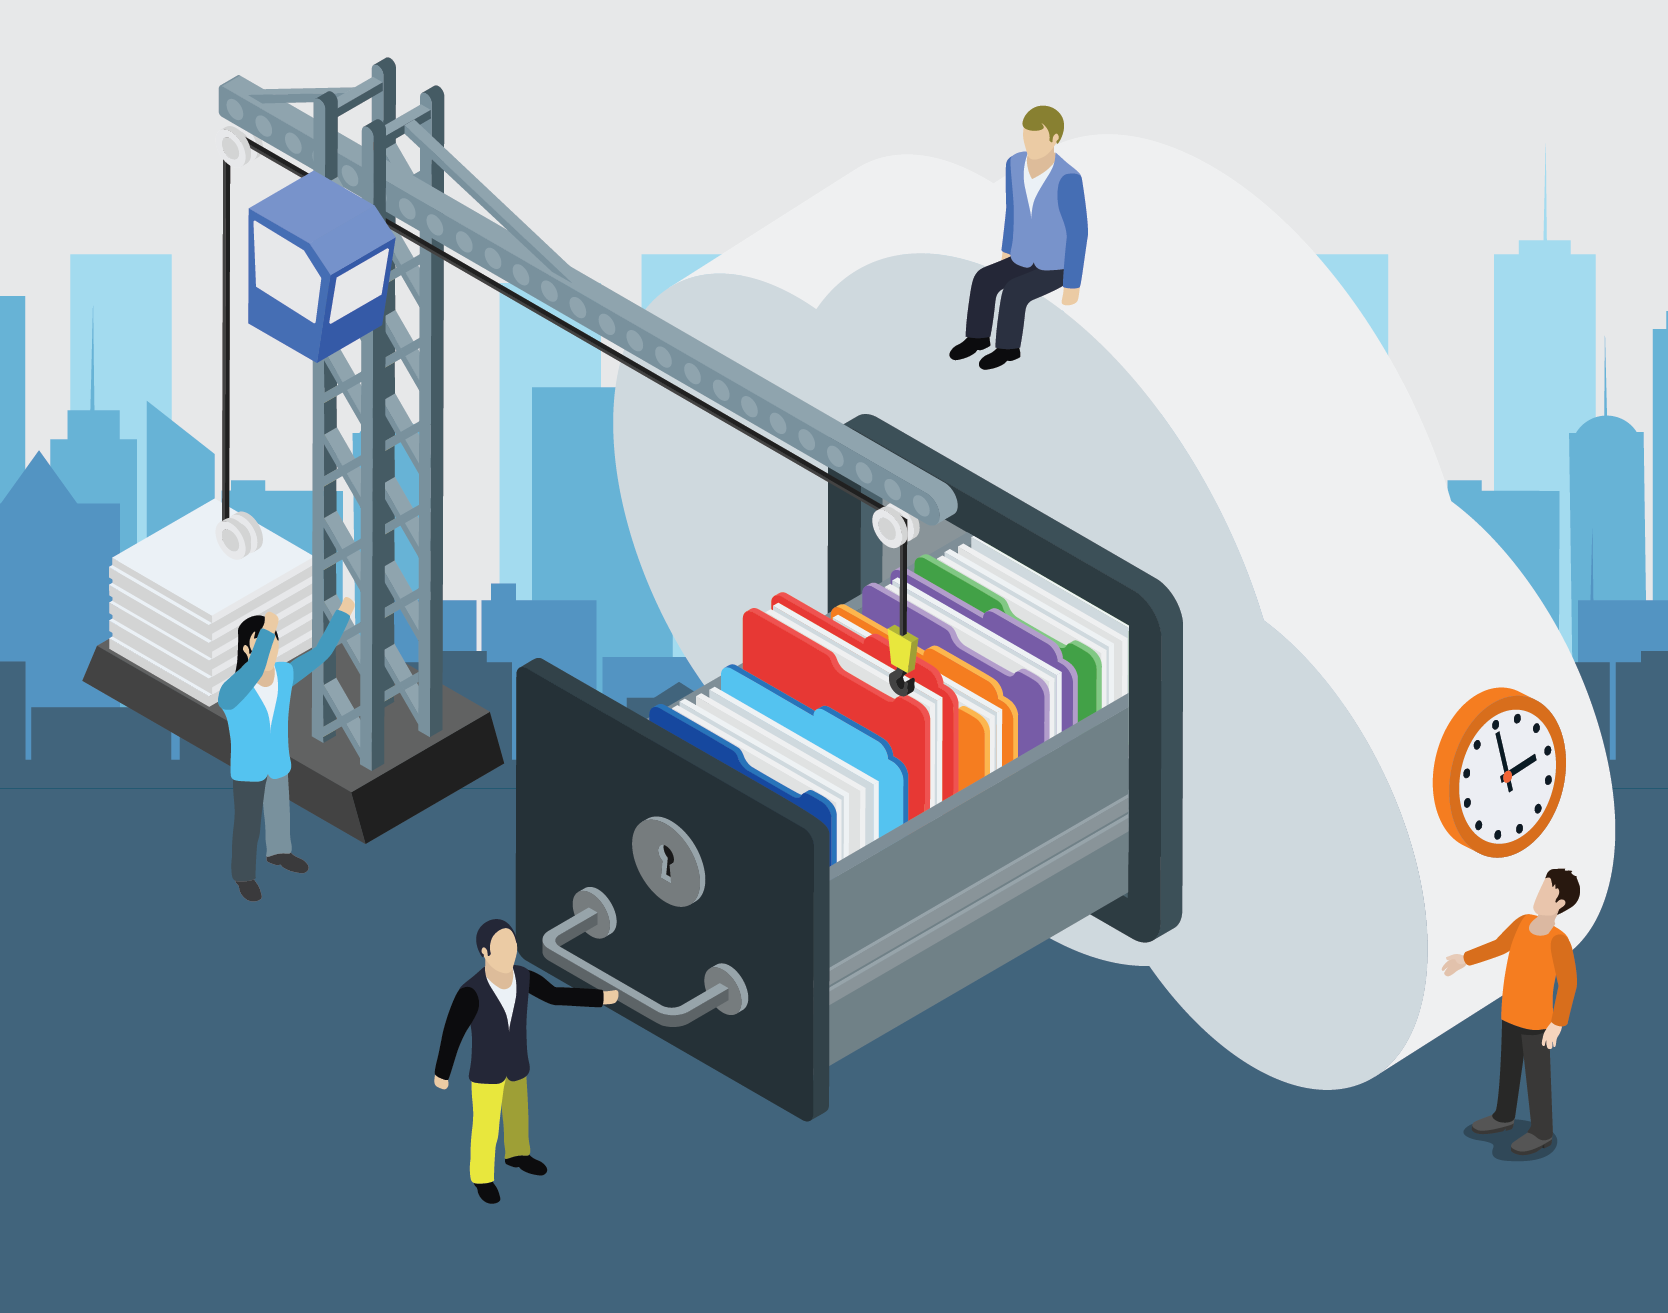 infographic-resources-vendor-product-risk-documentation